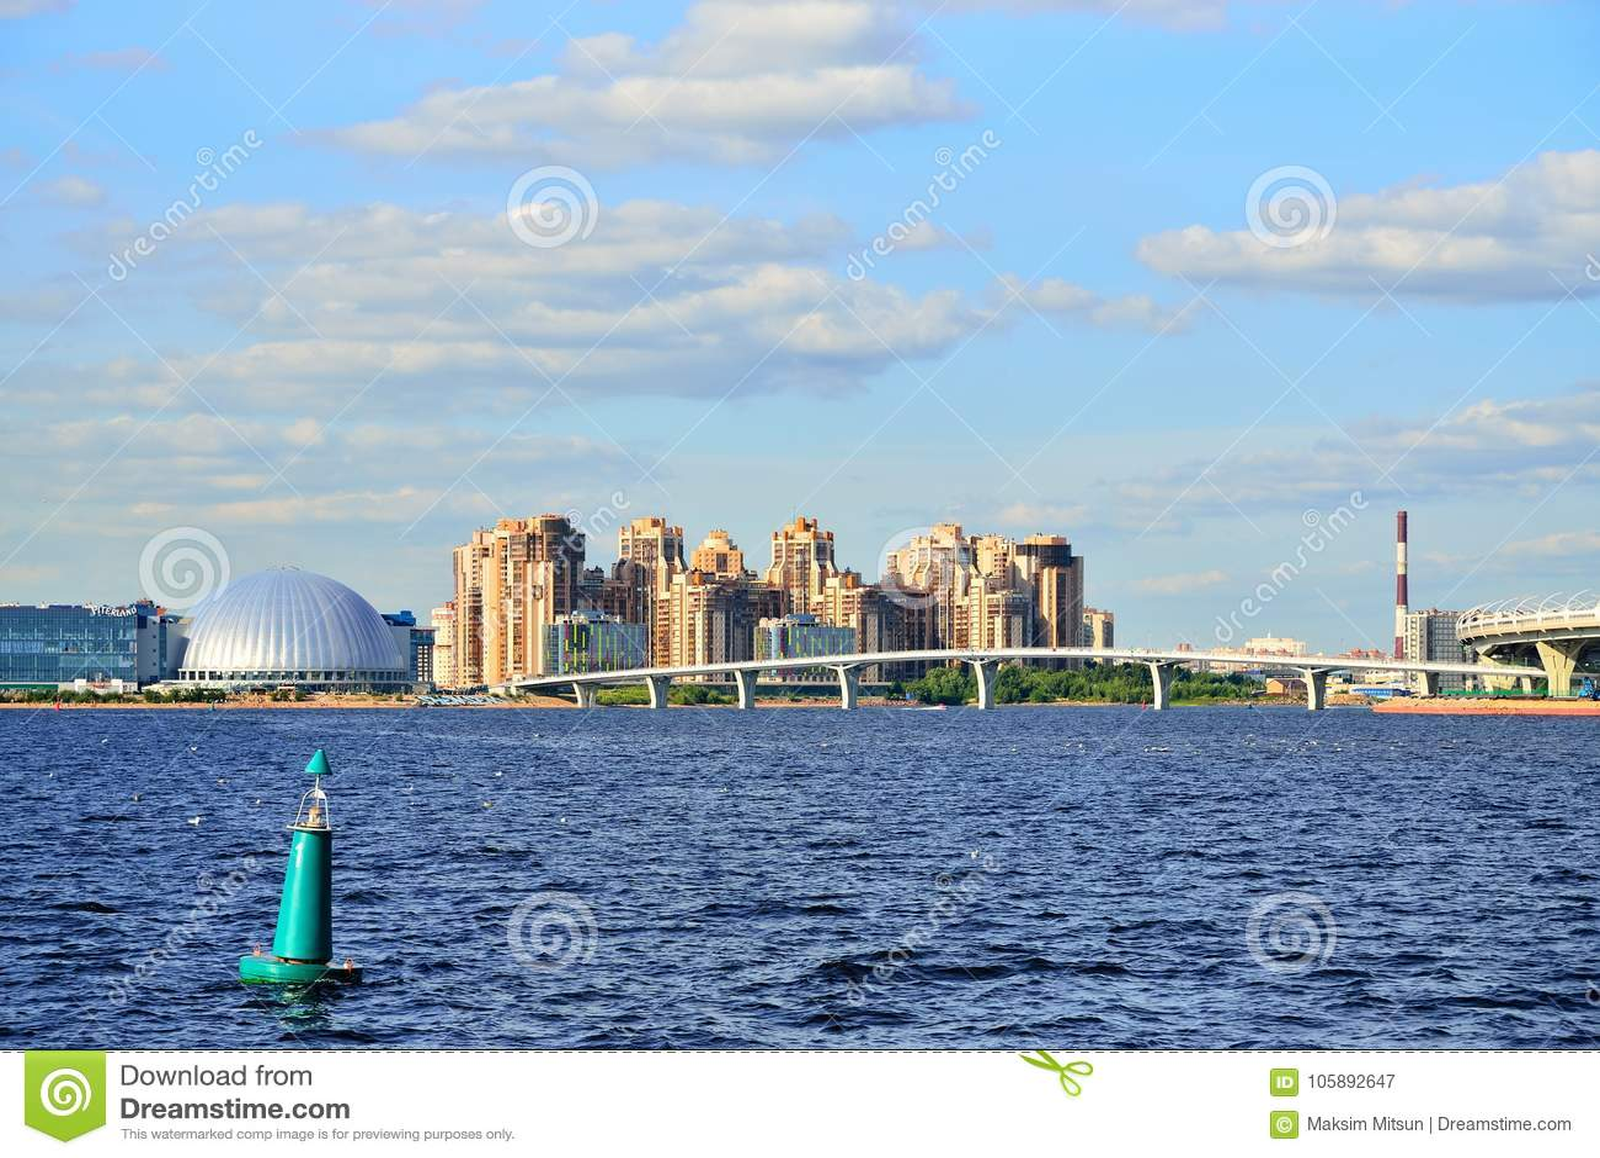 Neva Bay, St. Petersburg: description 71